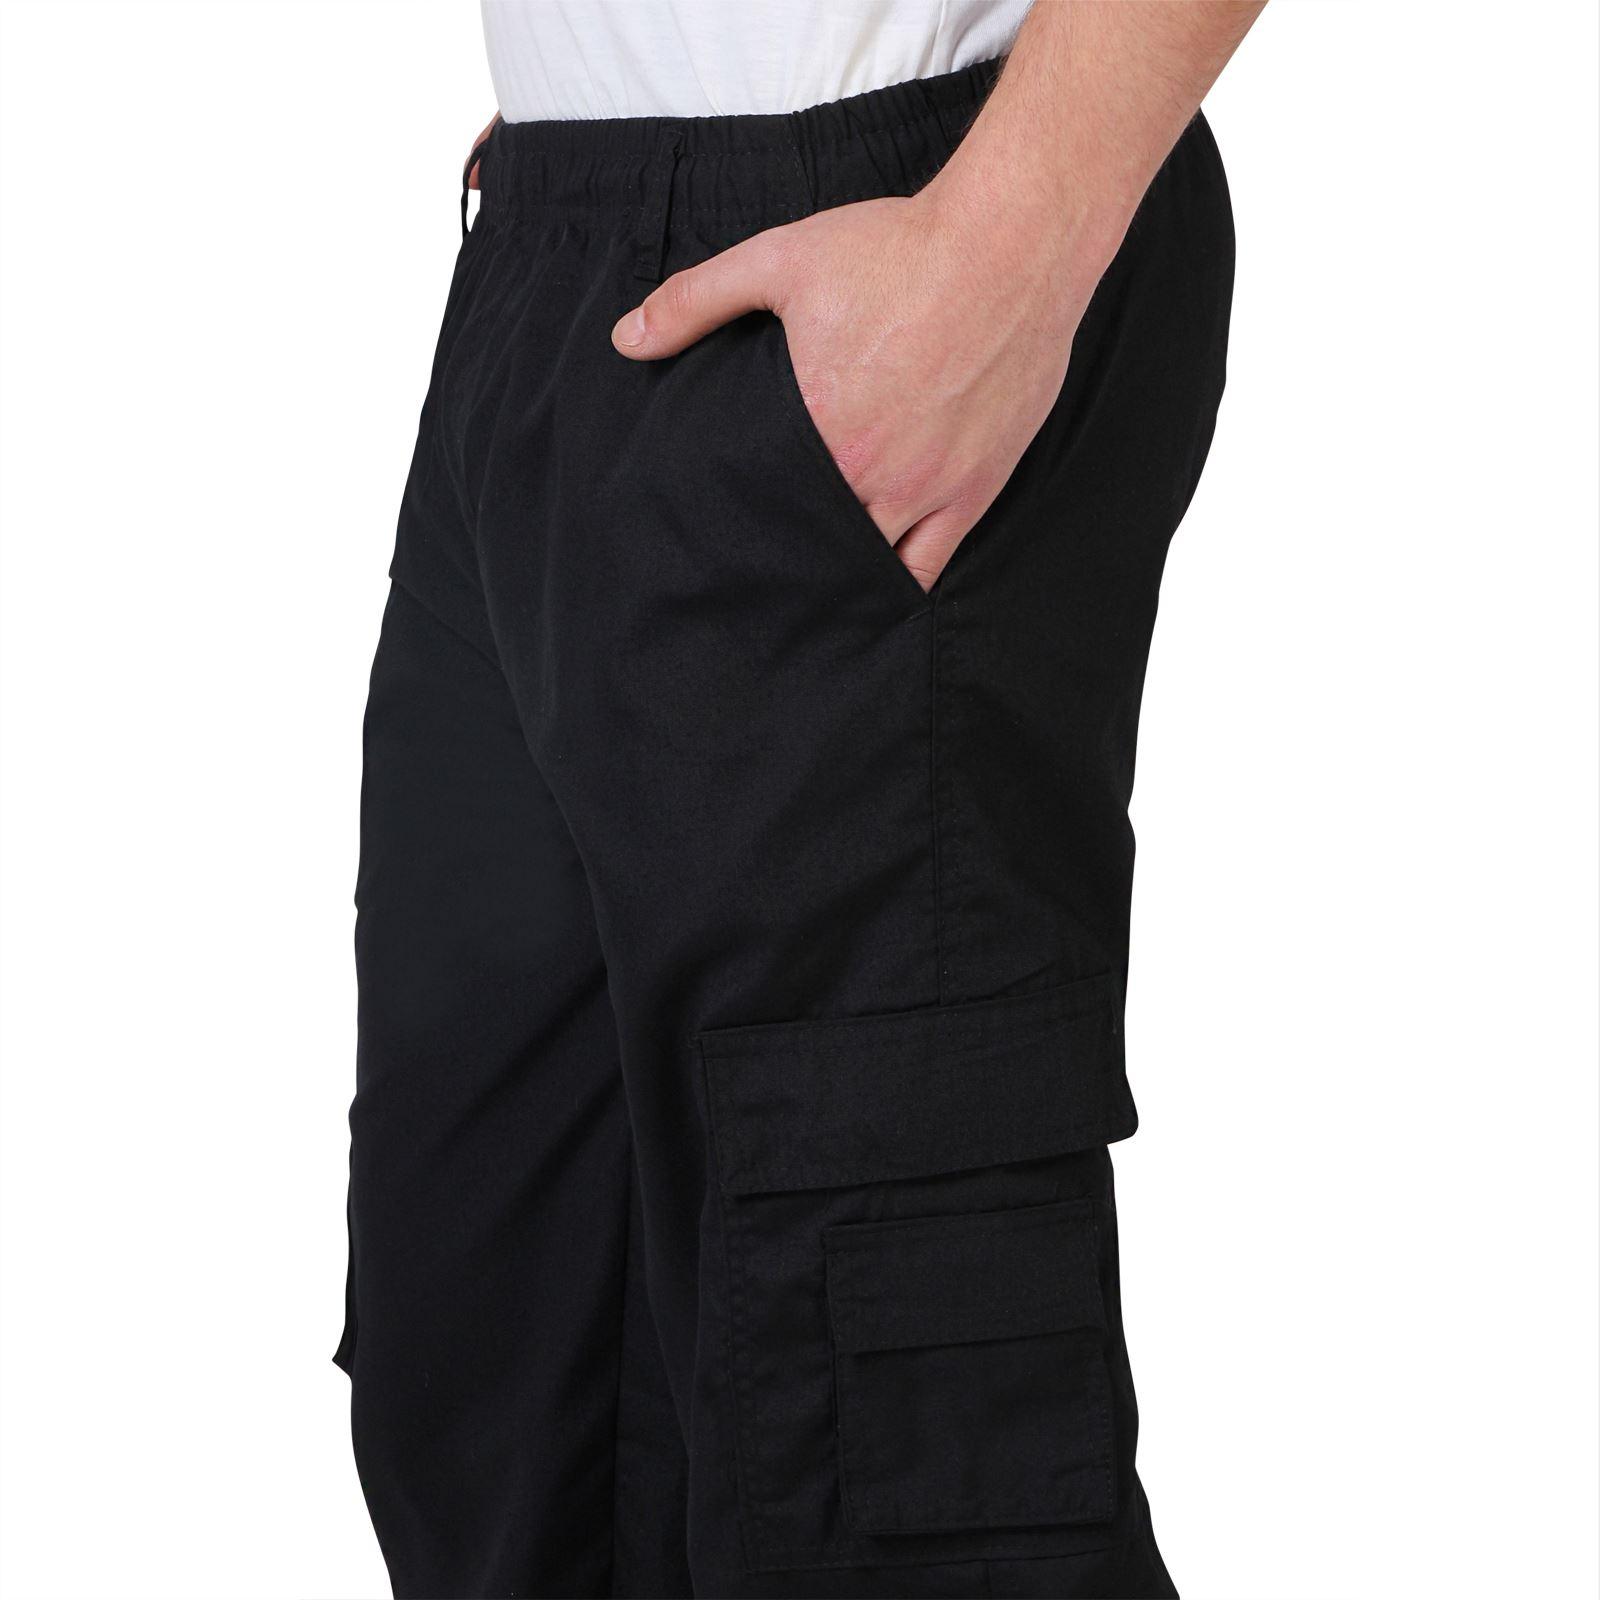 Pantalones-Hombre-Estilo-Cargo-Militar-Combate-Multibolsillos-Casual miniatura 30